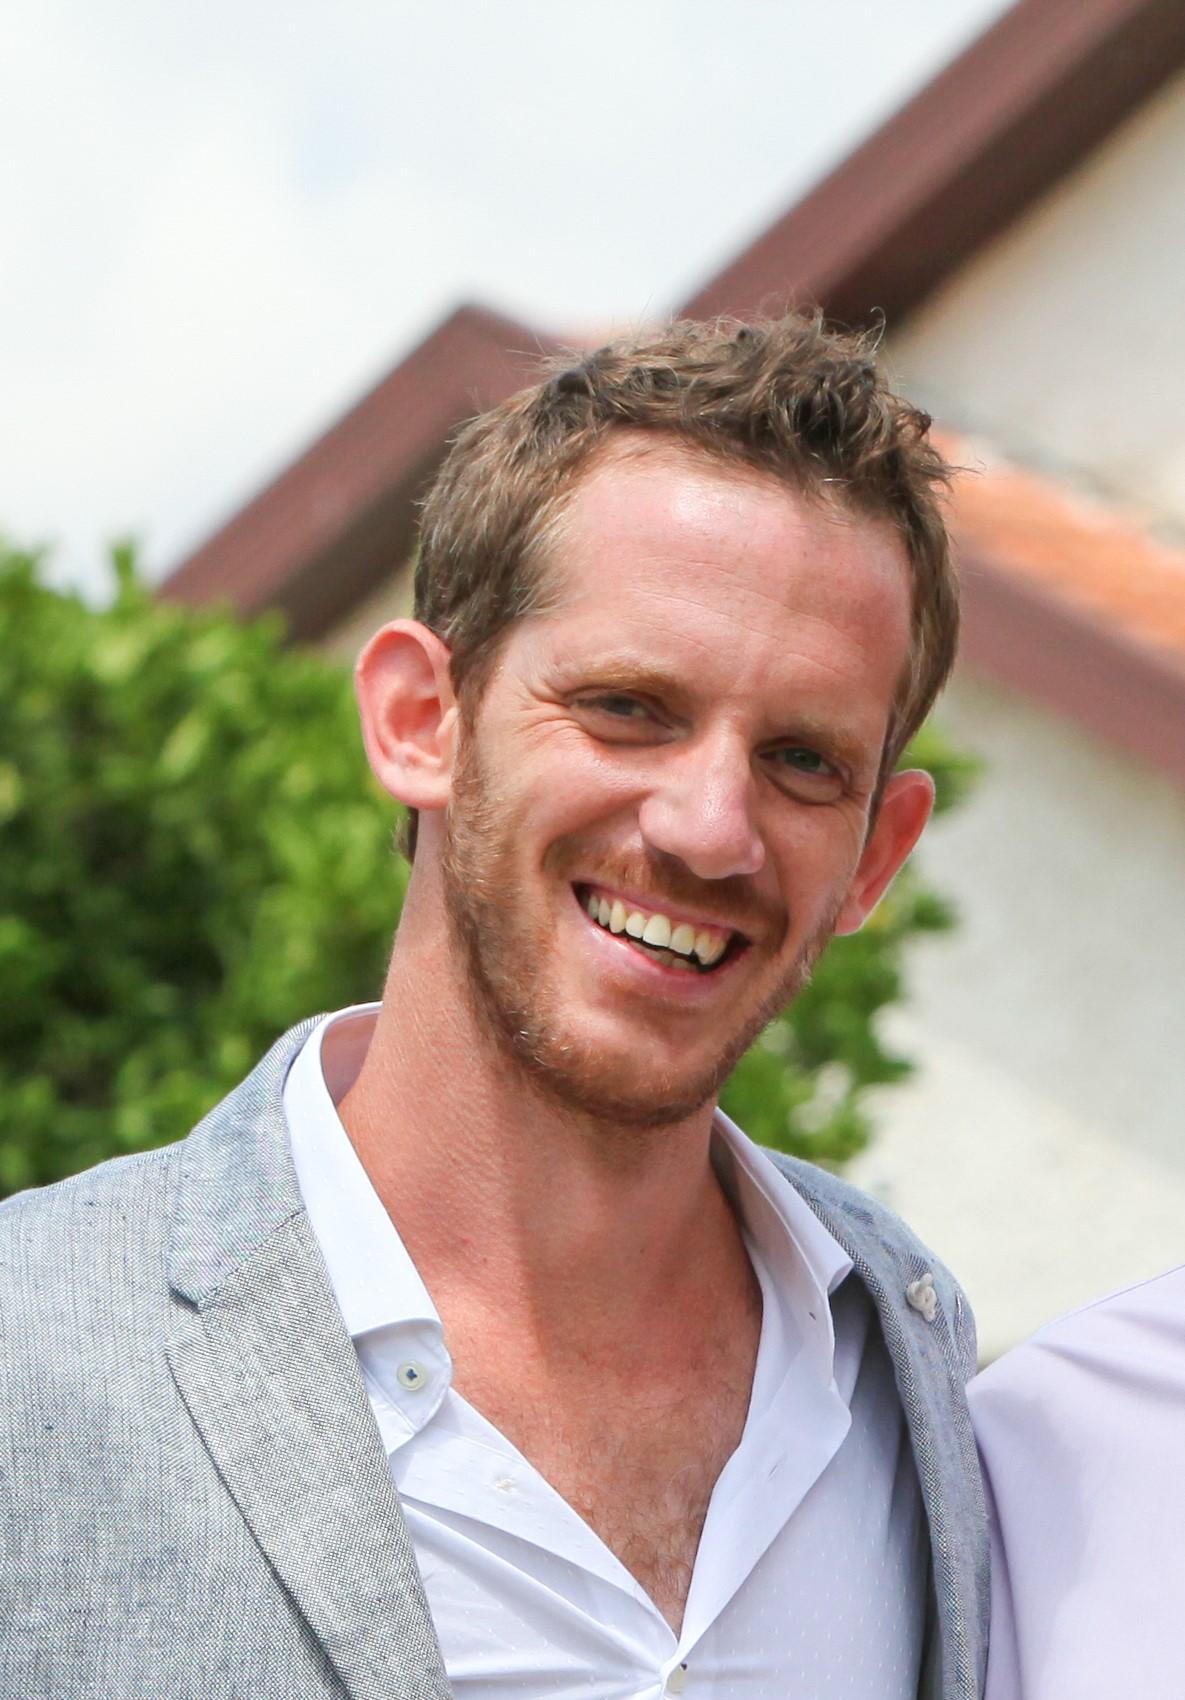 Alon  Alperovitz, CF Associate Member (UK, Israel, Europe), LSE  Alon is an entrepreneur, teacher, thinker and researcher in the area of entrepreneurship, identity, economics and psychology.